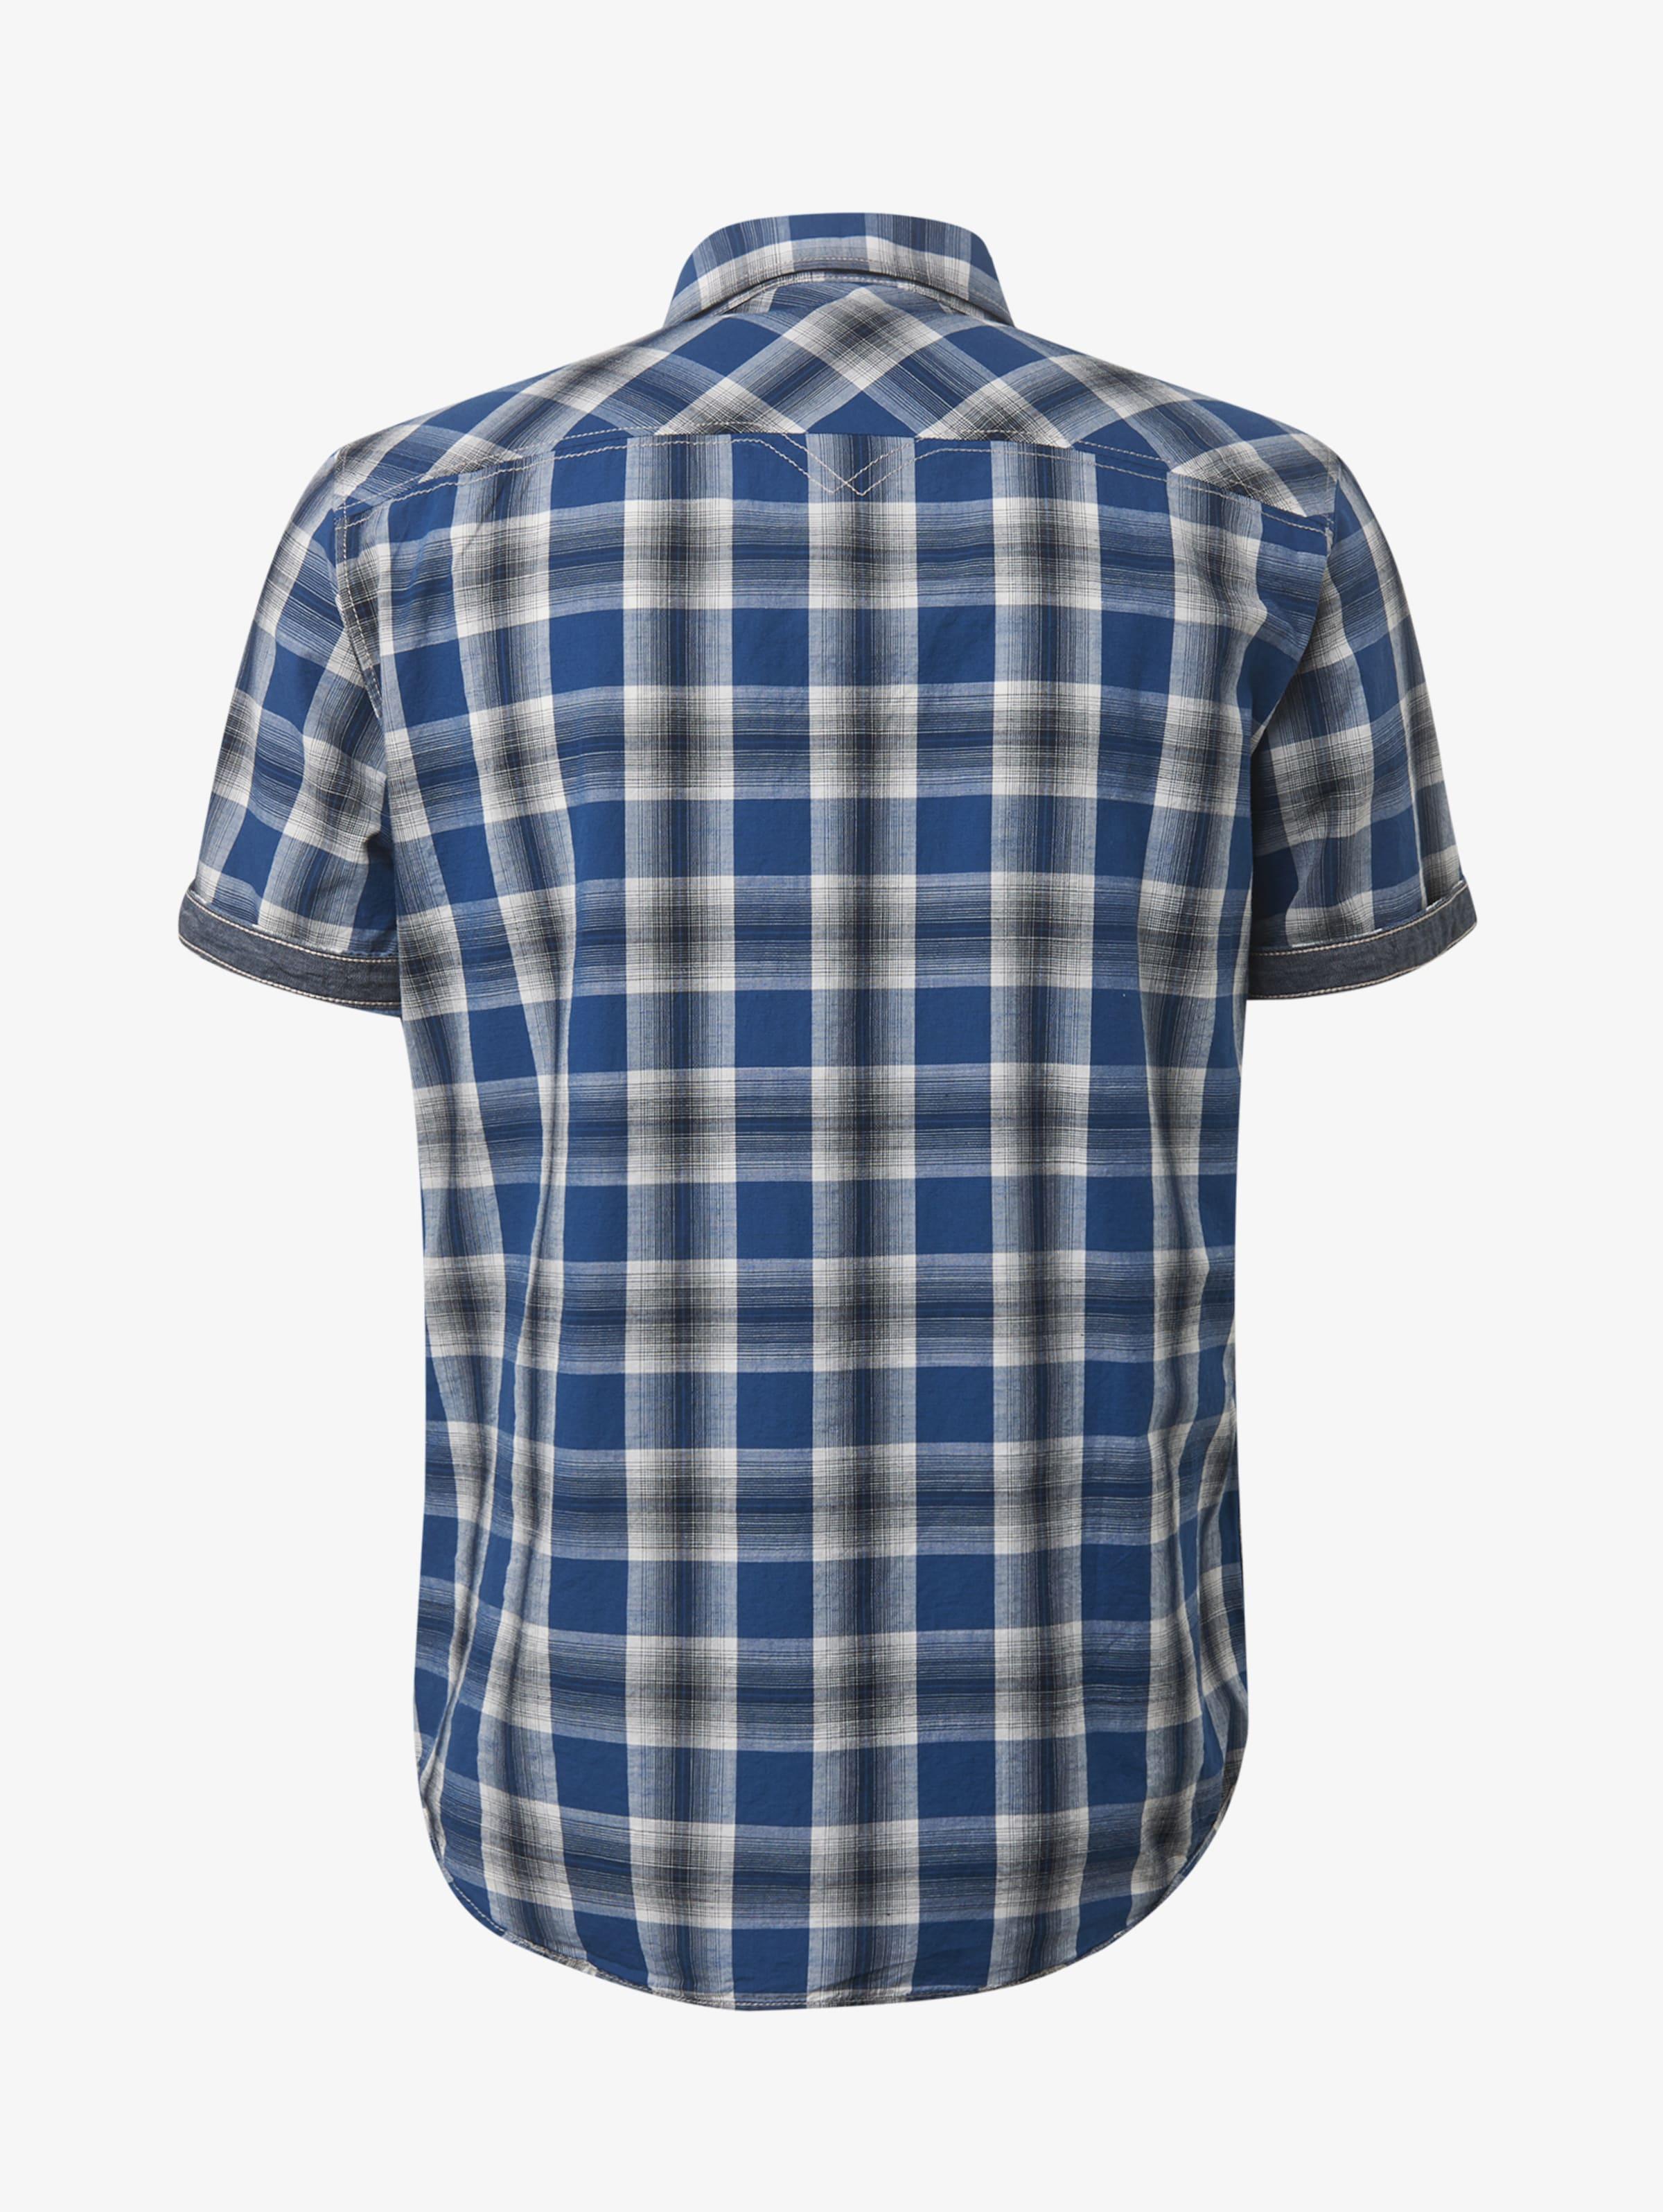 Tom Kurzarmhemd Dunkelblau Tailor In Kariertes 4Aj3RcqL5